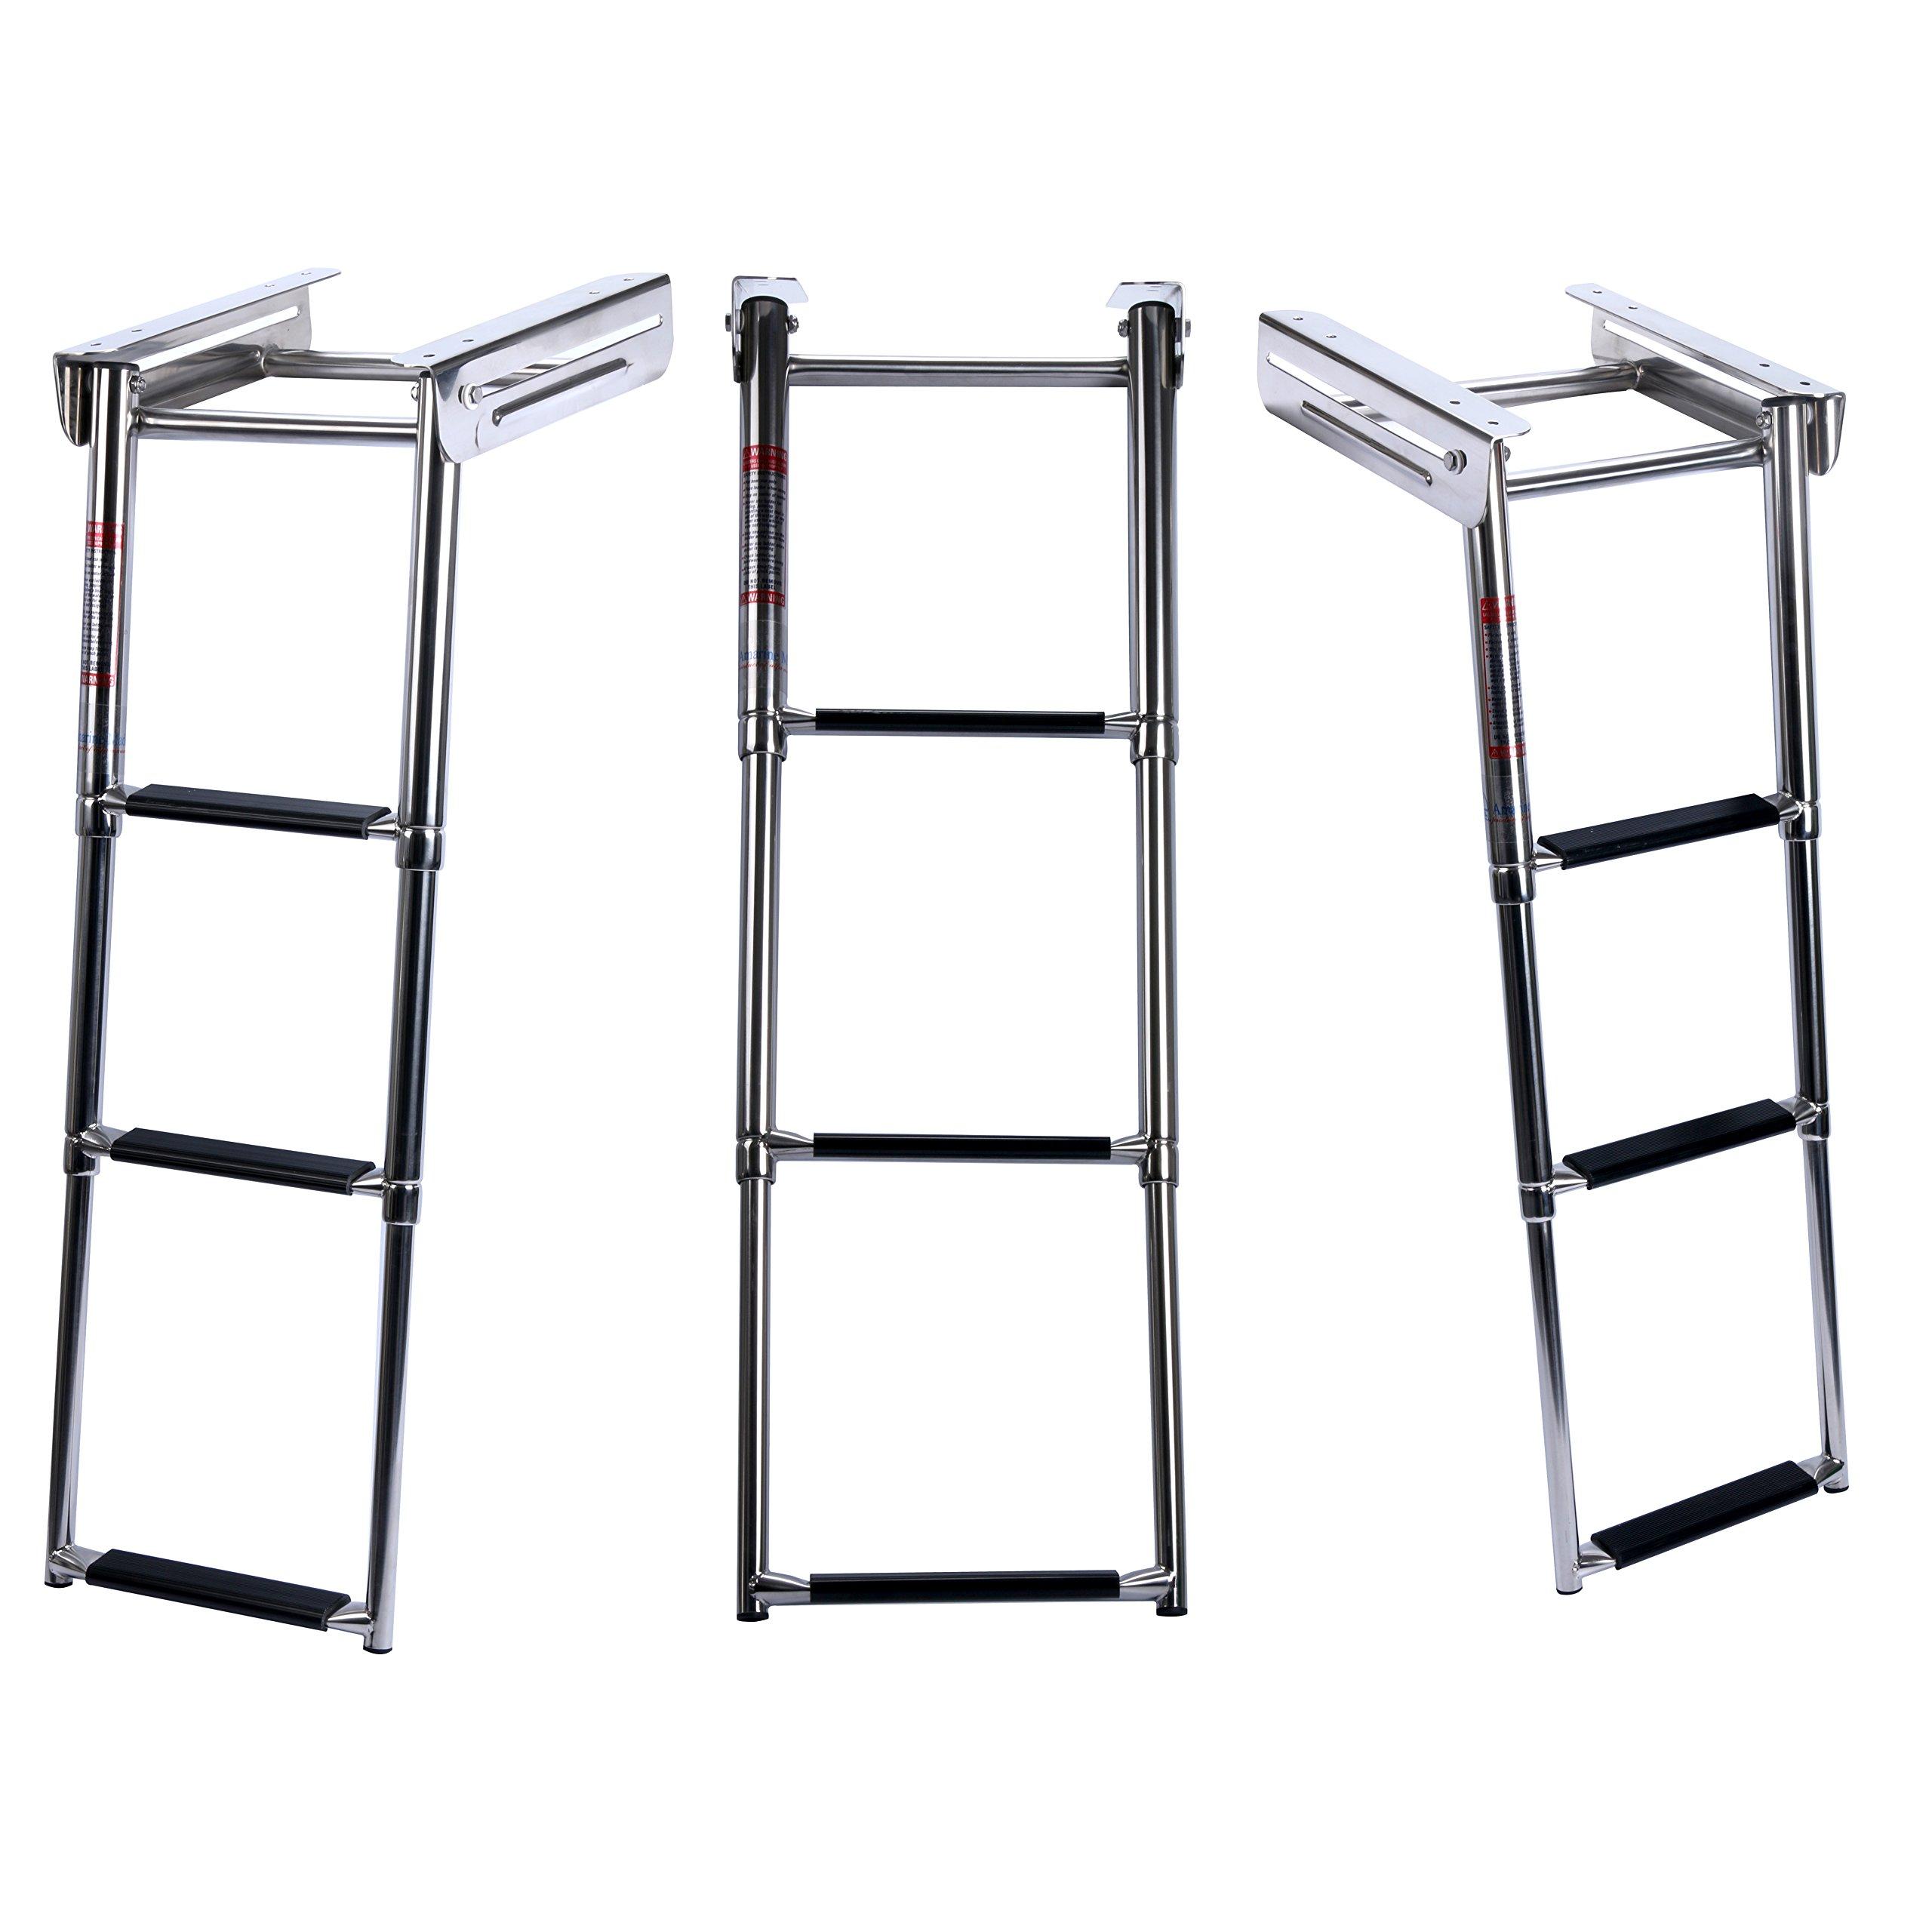 Amarine-made 3-step Under Platform Slide Mount Boat Boarding Ladder, Telescoping, Stainless Steel